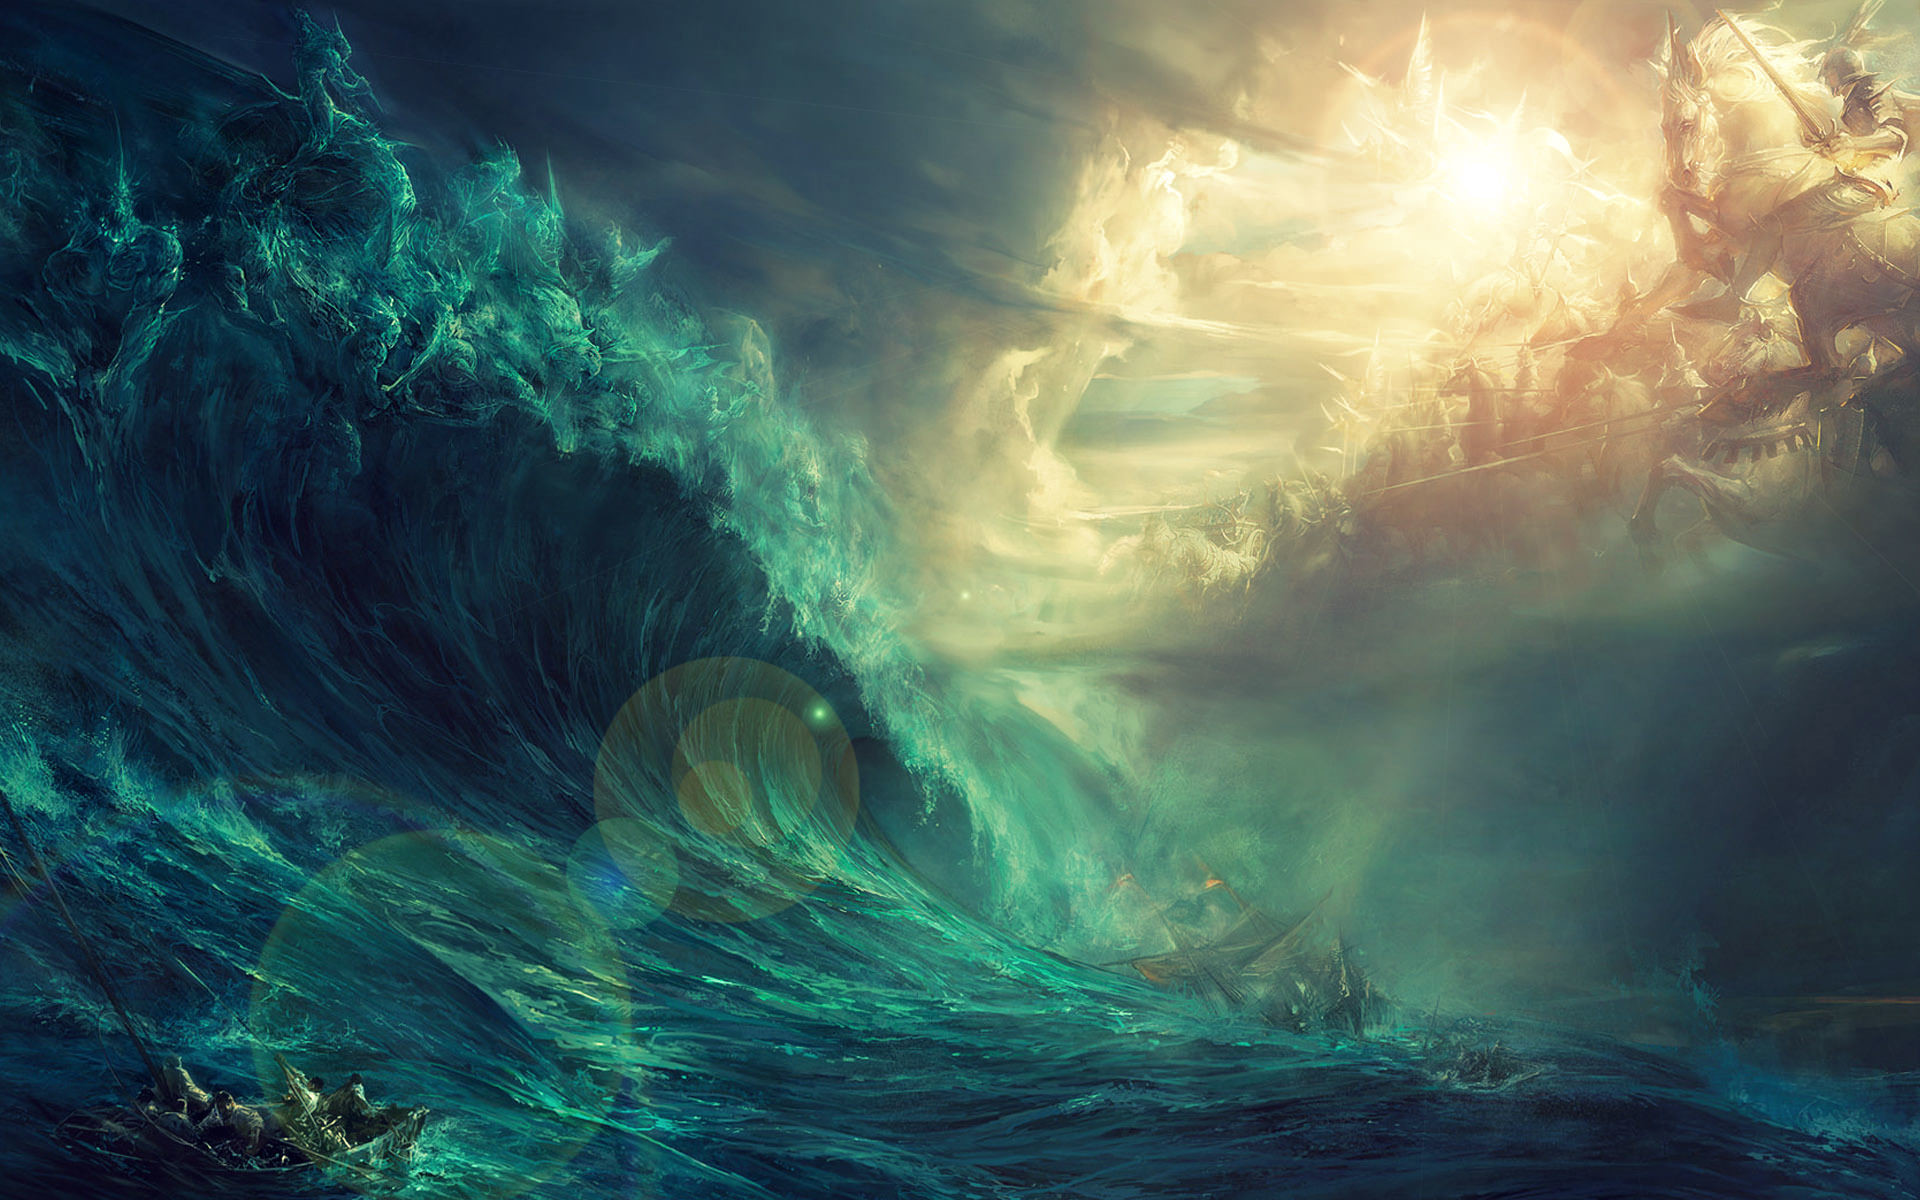 Epic Gods of Land vs Sea Wallpaper